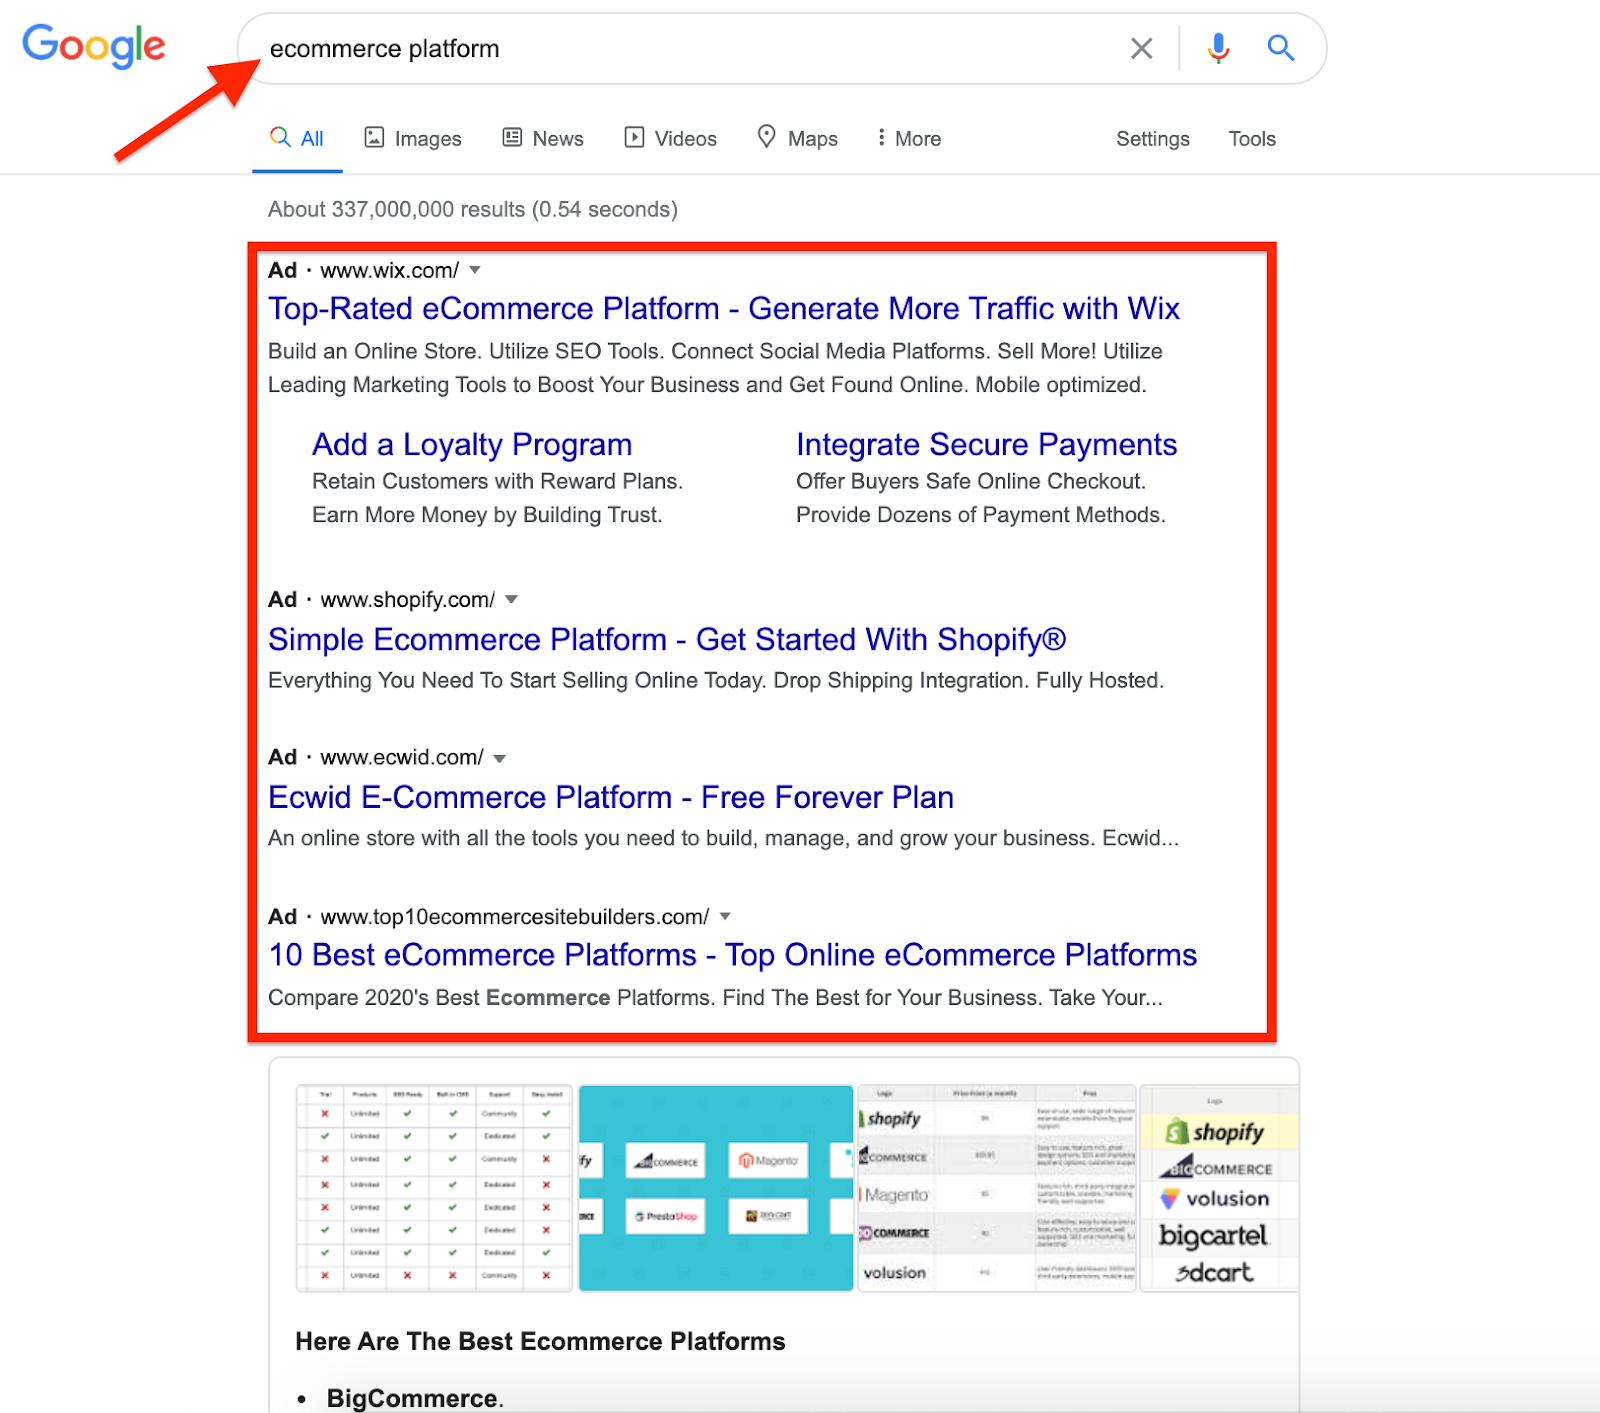 Ecommerce Platform Google Search